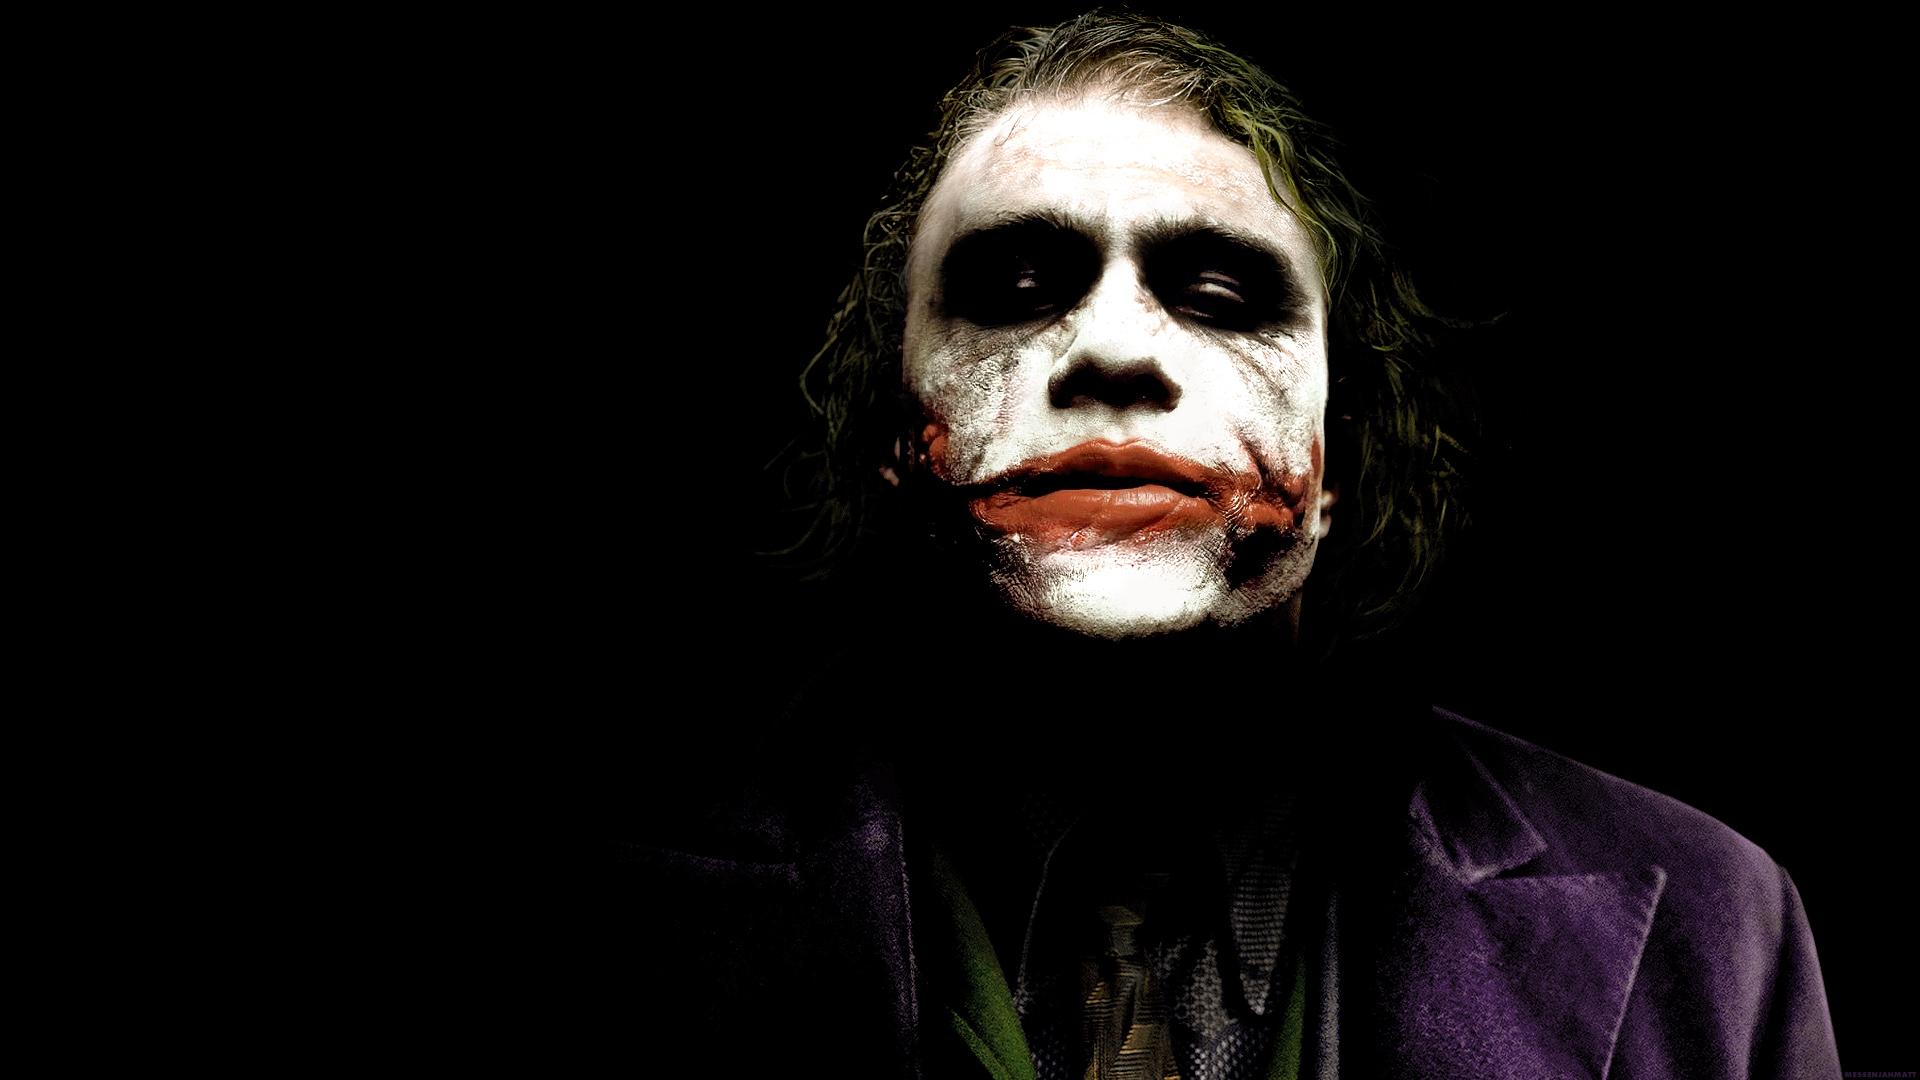 Joker Heath Ledger wallpaper   673629 1920x1080